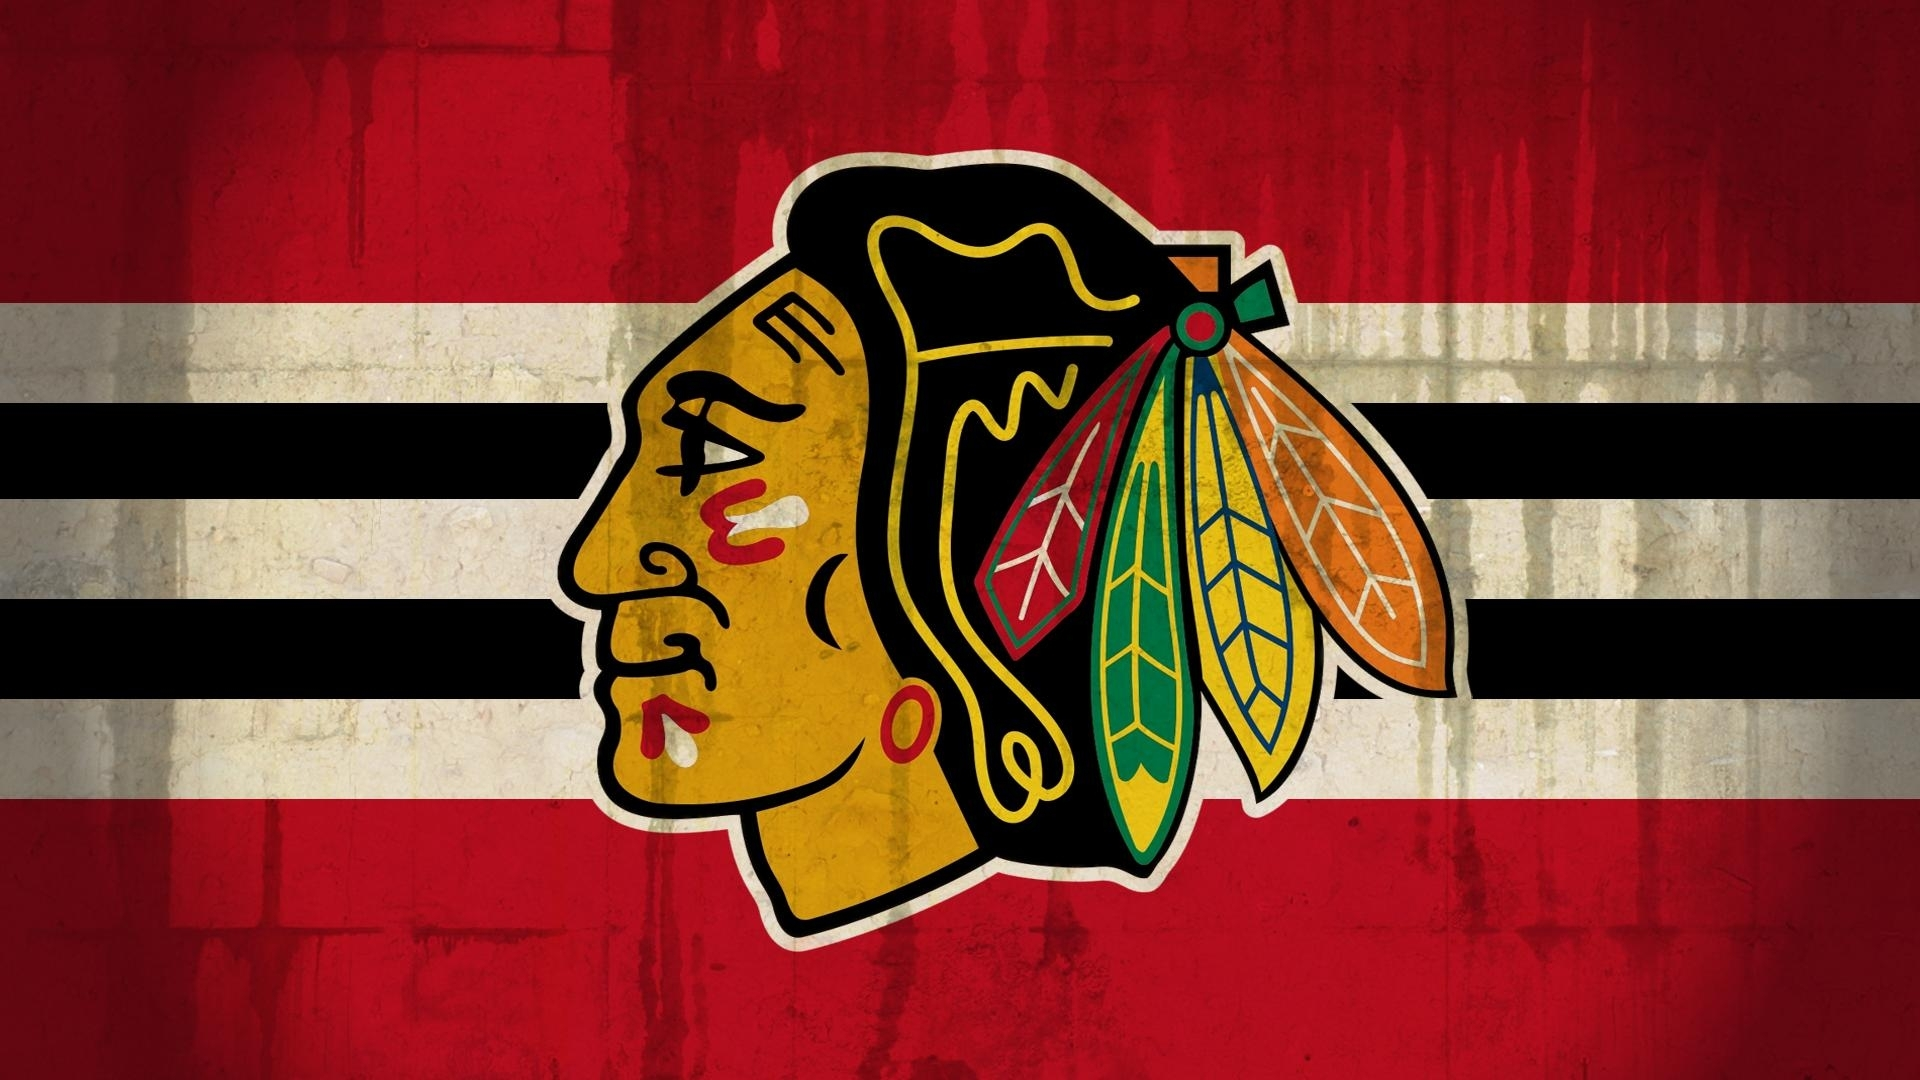 chicago blackhawks hd wallpaper 52493 1920x1080 px ~ hdwallsource